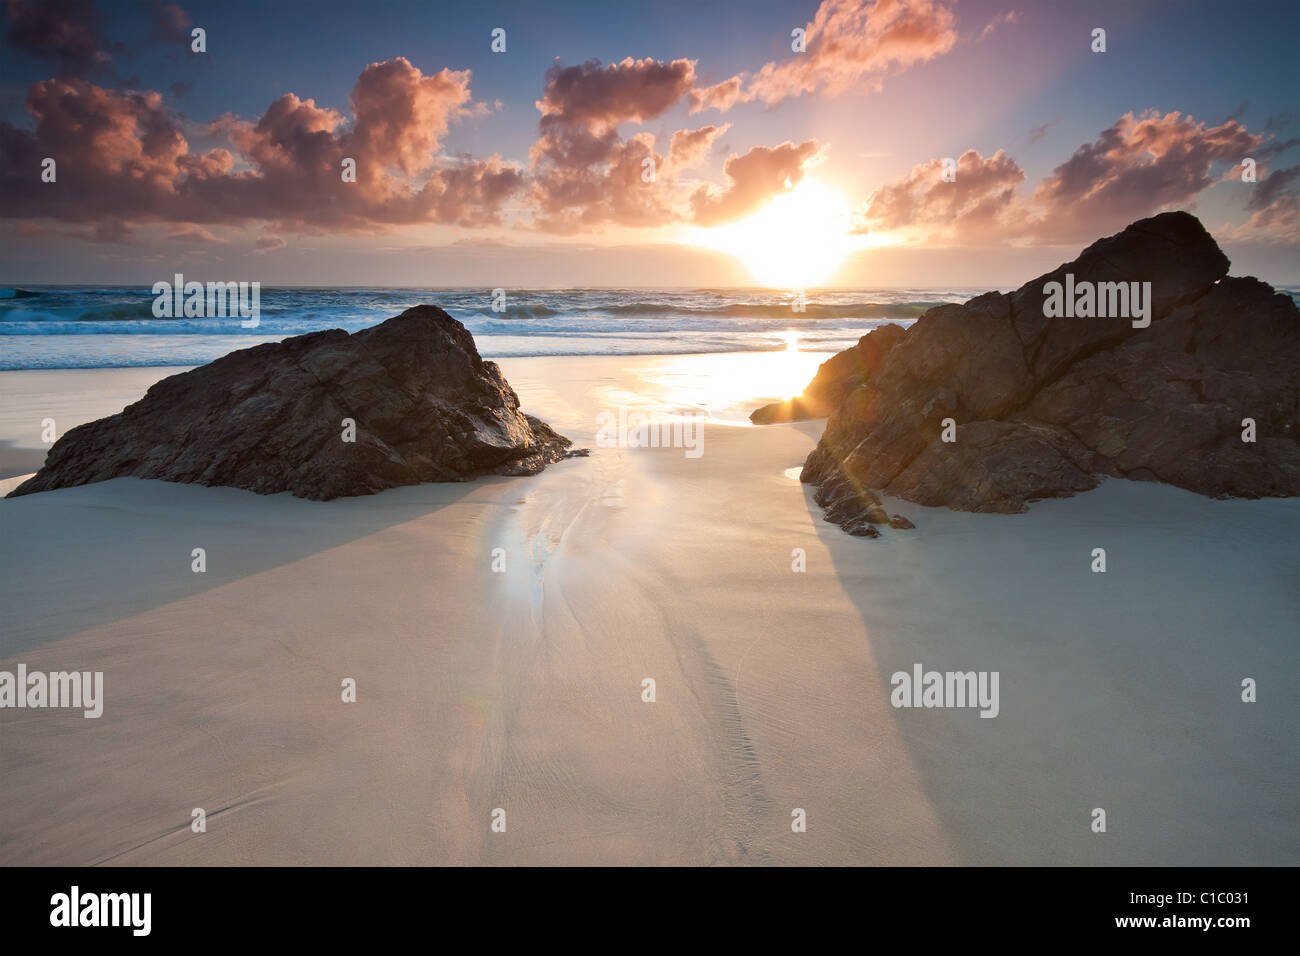 Seascape australiano al amanecer (miami beach, Queensland, Australia) Imagen De Stock